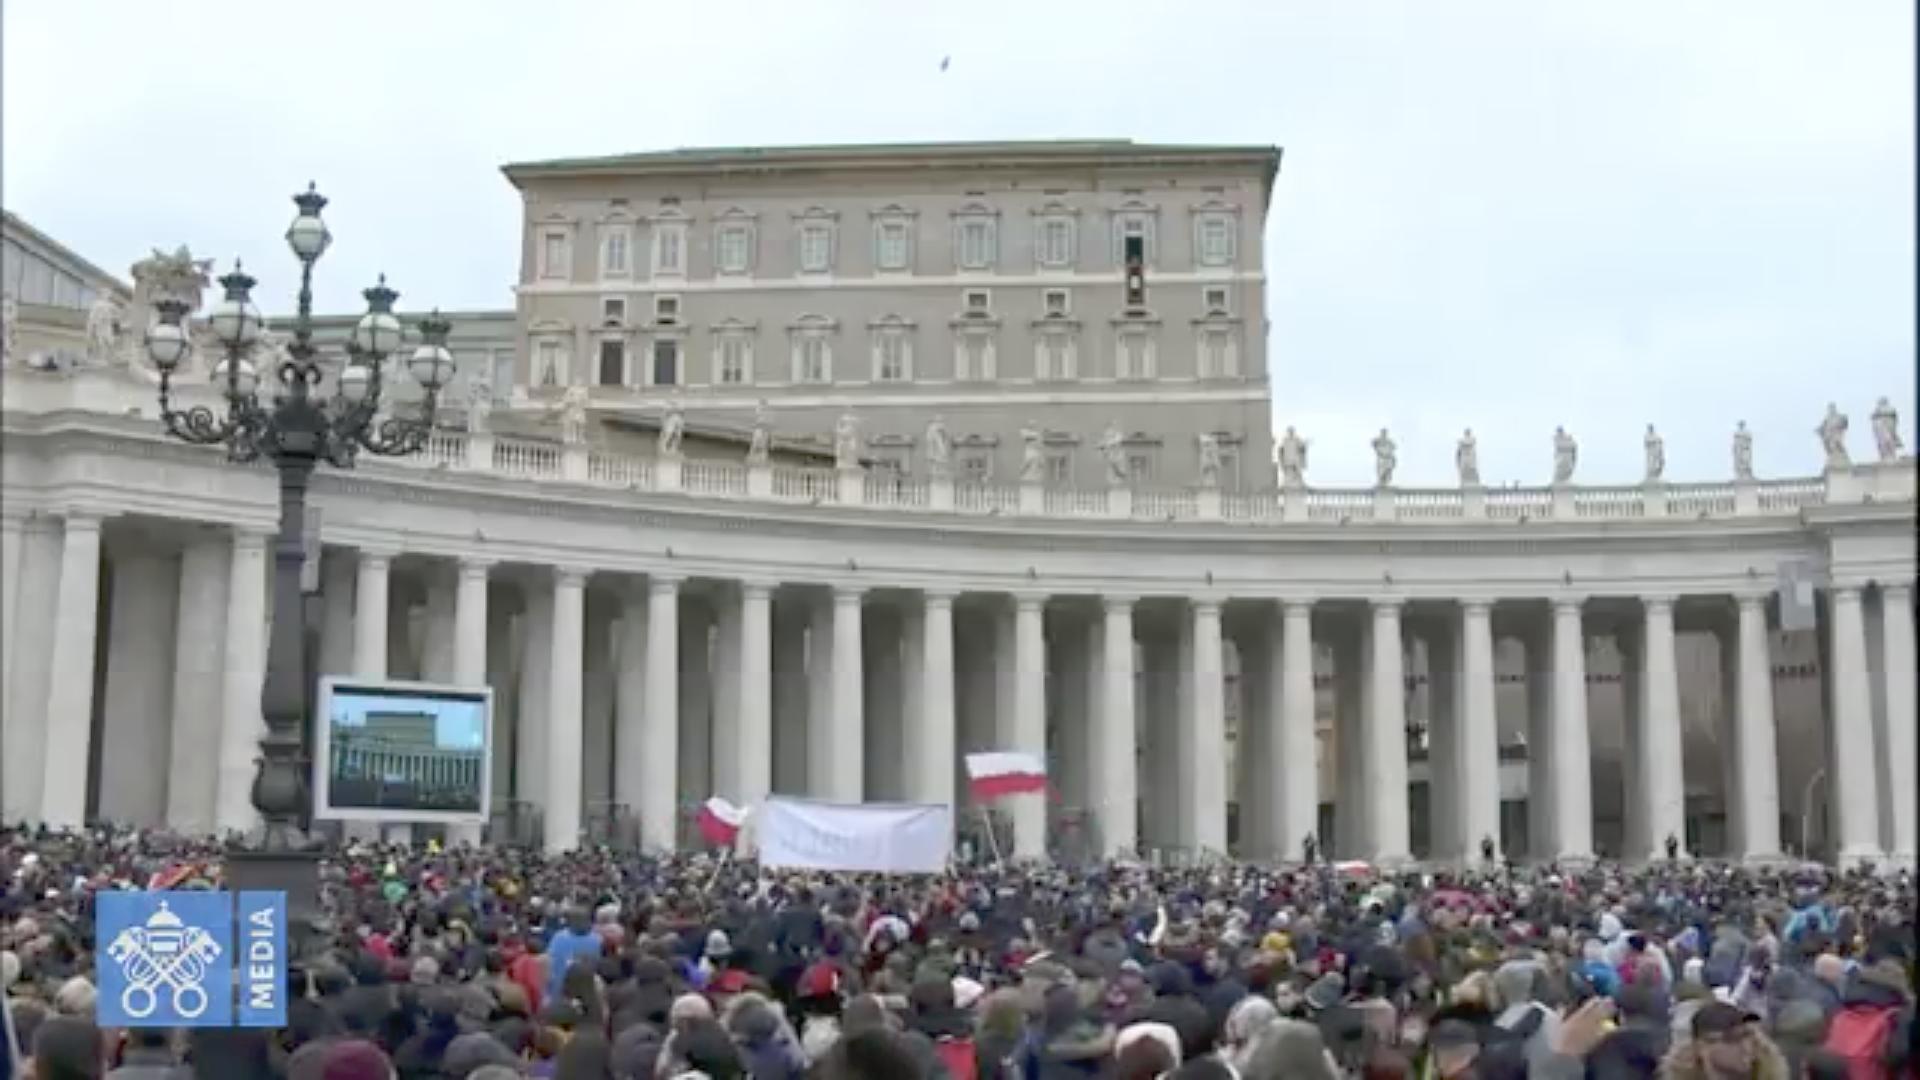 Angélus du 20 janvier 2019 @ Vatican Media